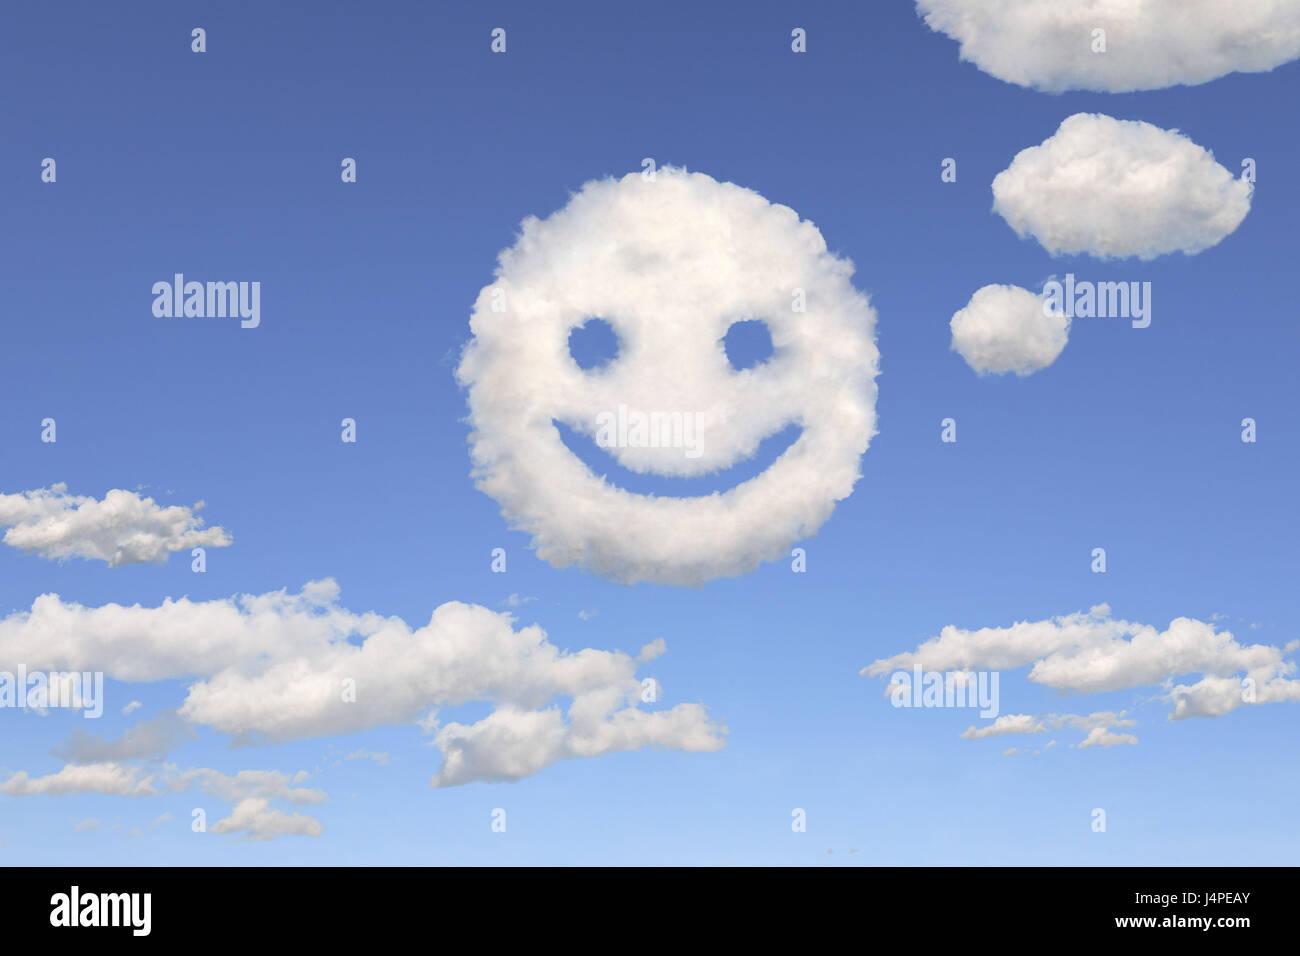 Smiley Cloud Stock Photos Smiley Cloud Stock Images Alamy